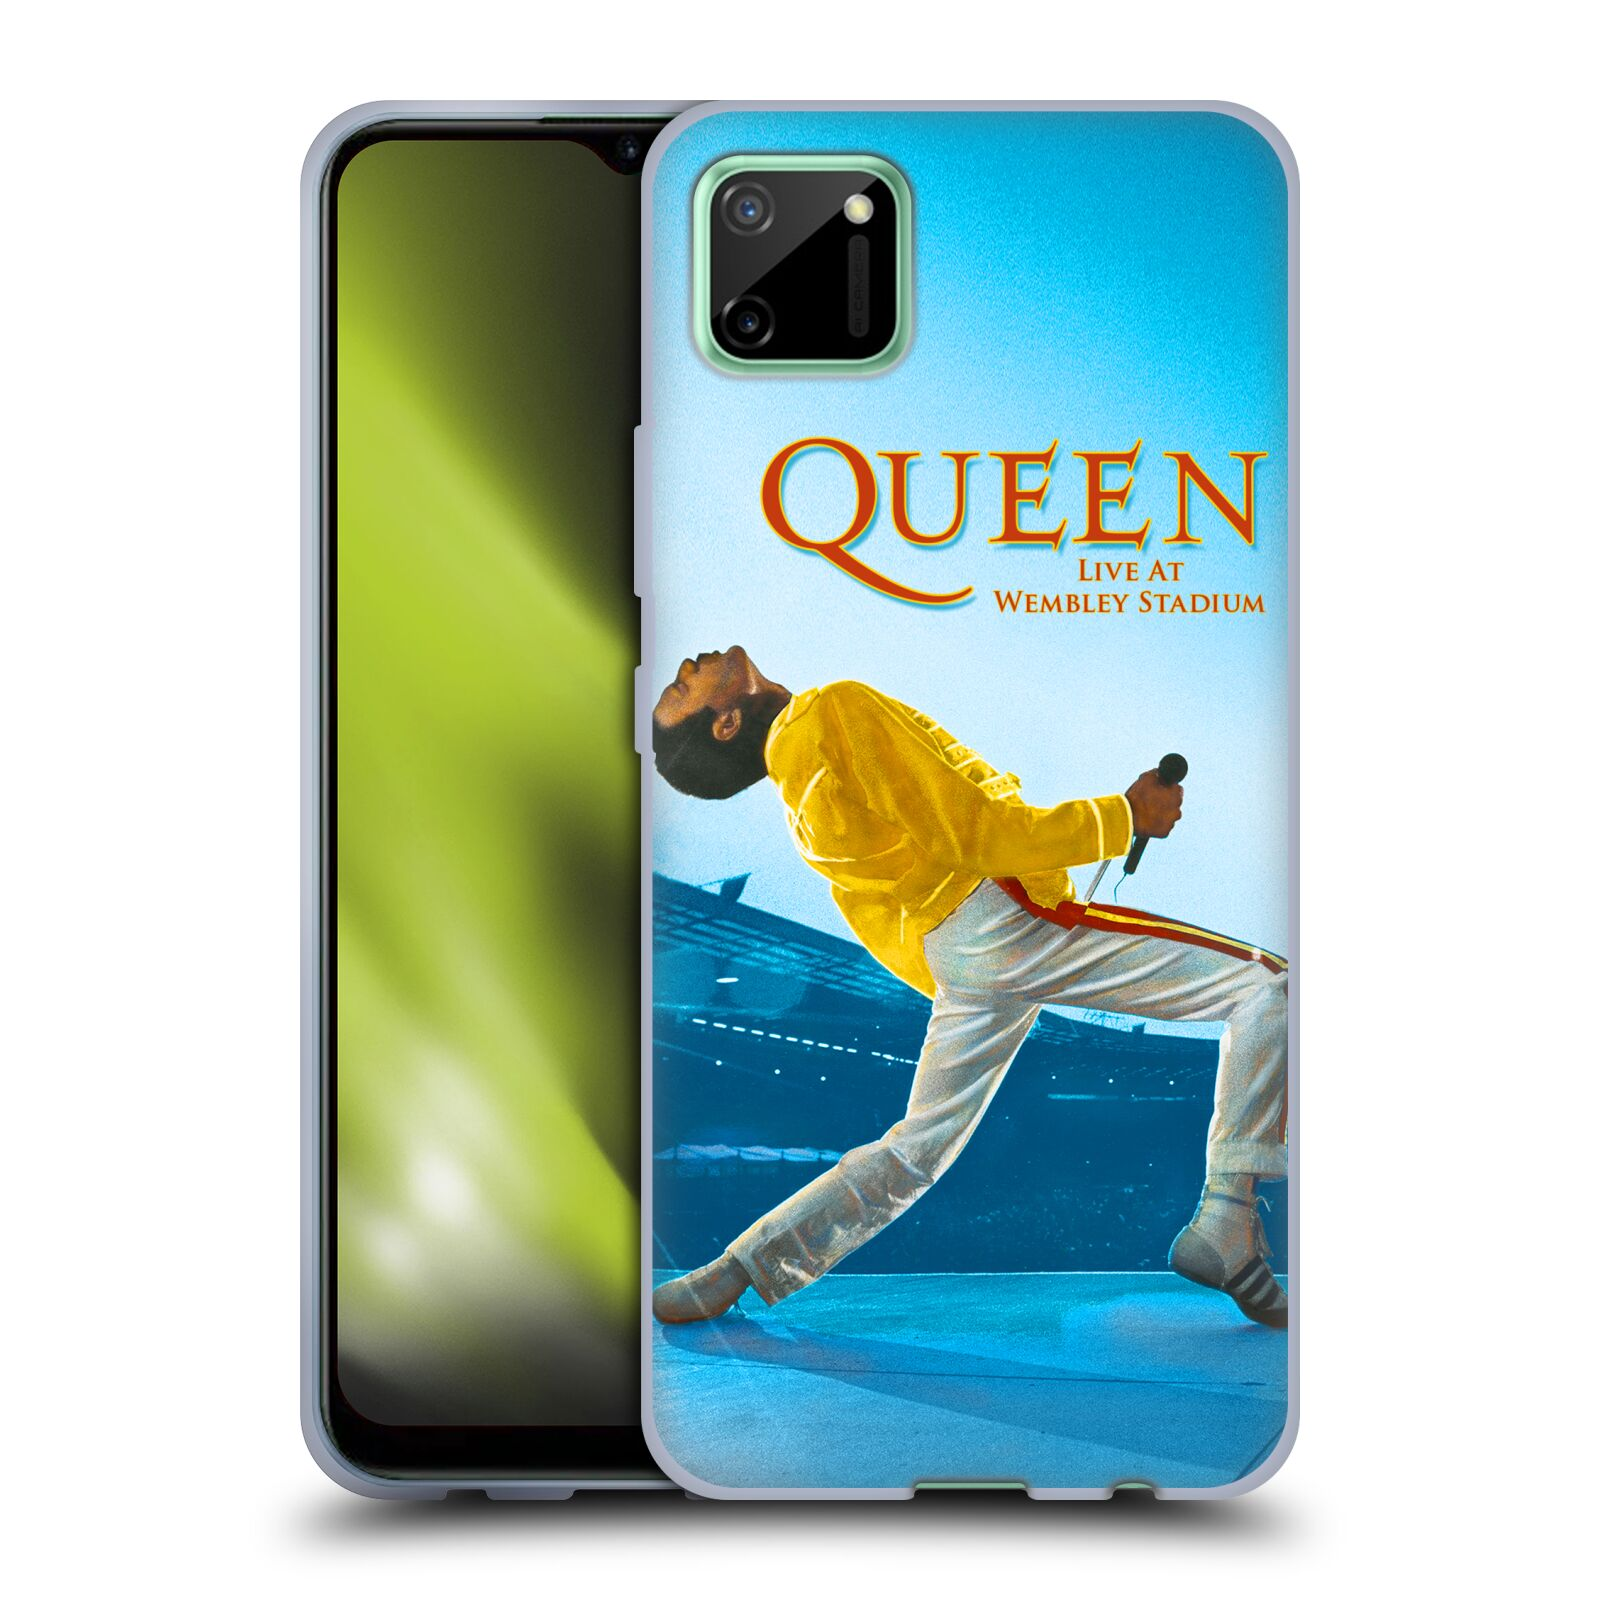 Silikonové pouzdro na mobil Realme C11 - Head Case - Queen - Freddie Mercury